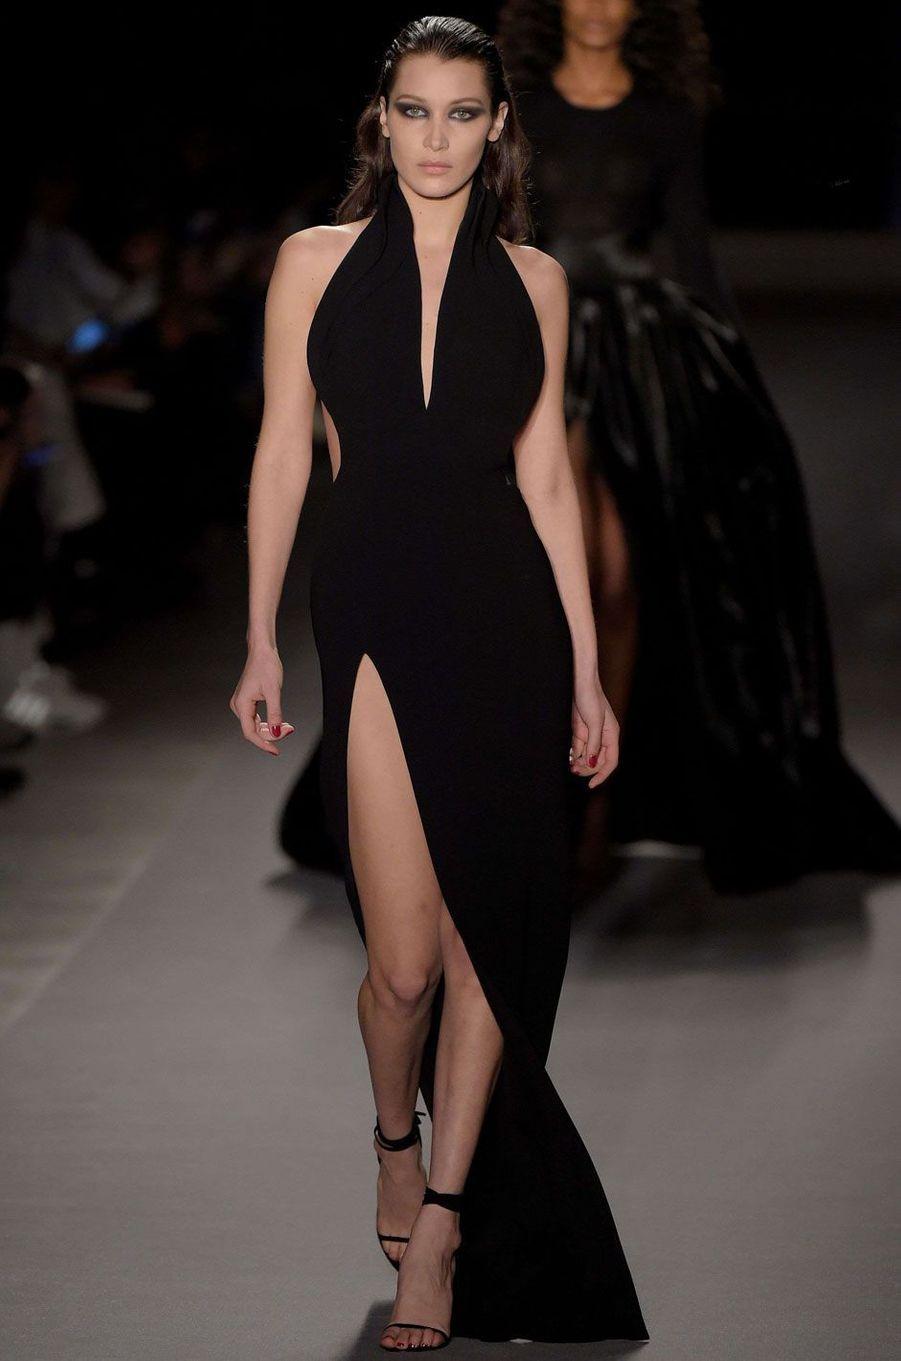 Bella Hadid au défilé Brandon Maxwell à New York.